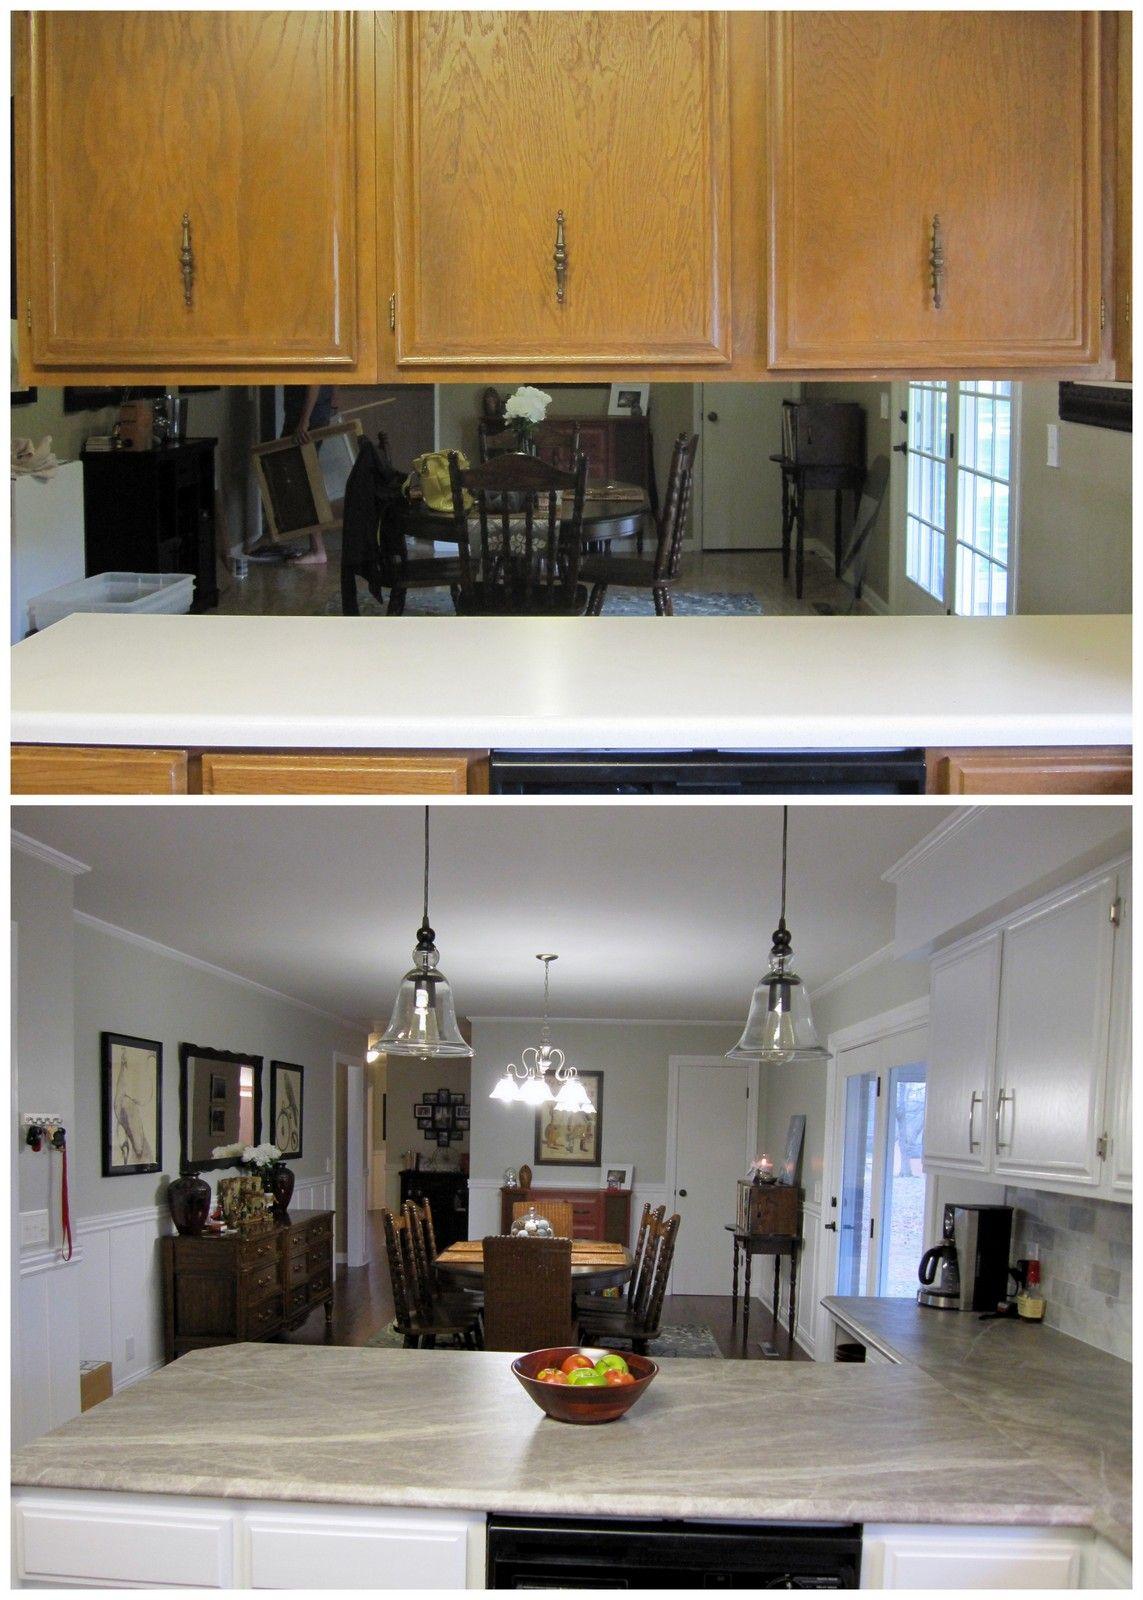 ScottandAllieBuyAHouse Kitchen5